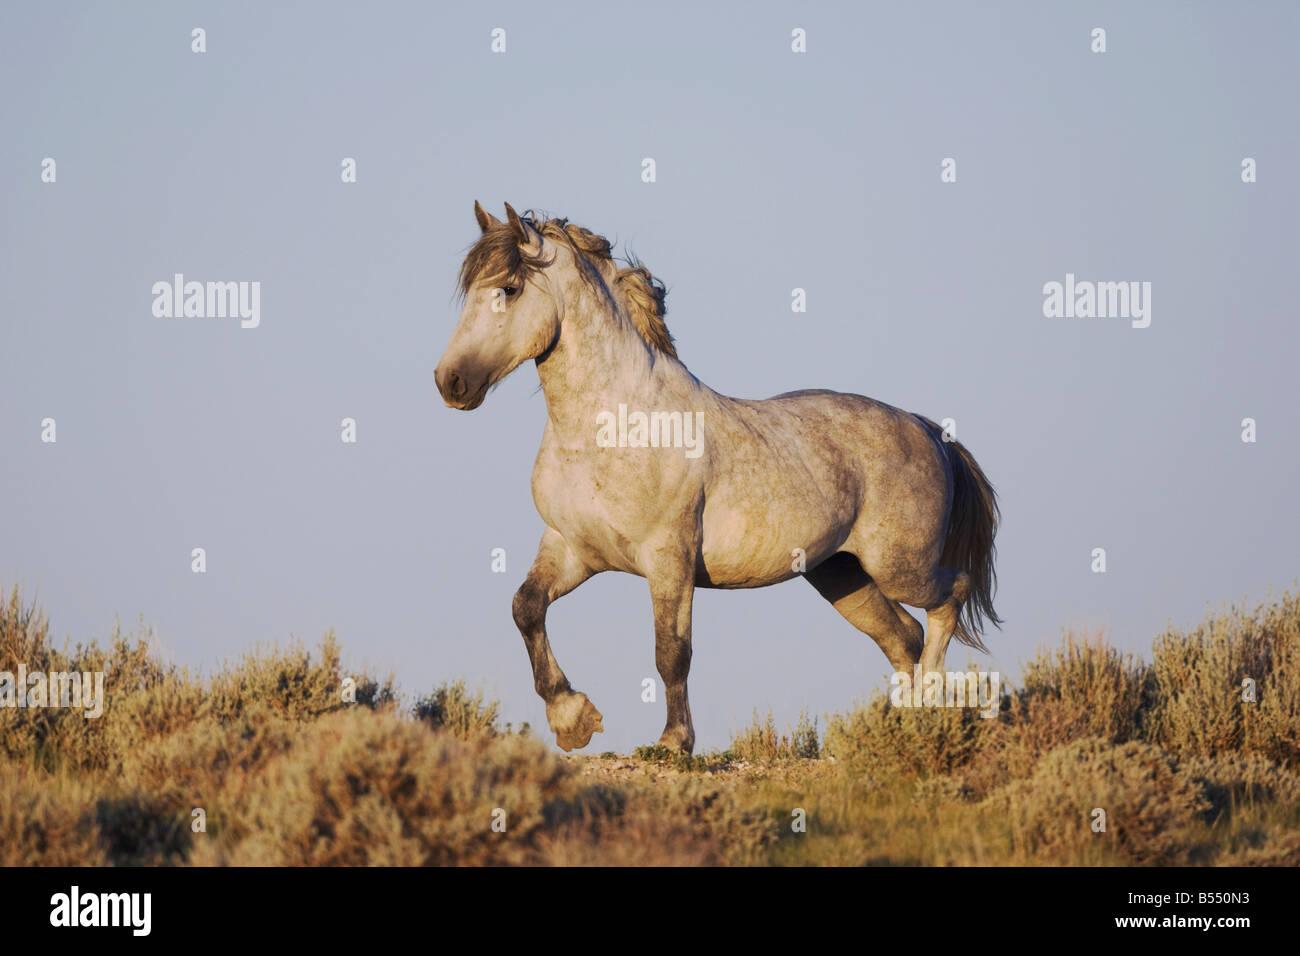 Mustang Horse Equus caballus adult Pryor Mountain Wild Horse Range Montana USA Stock Photo